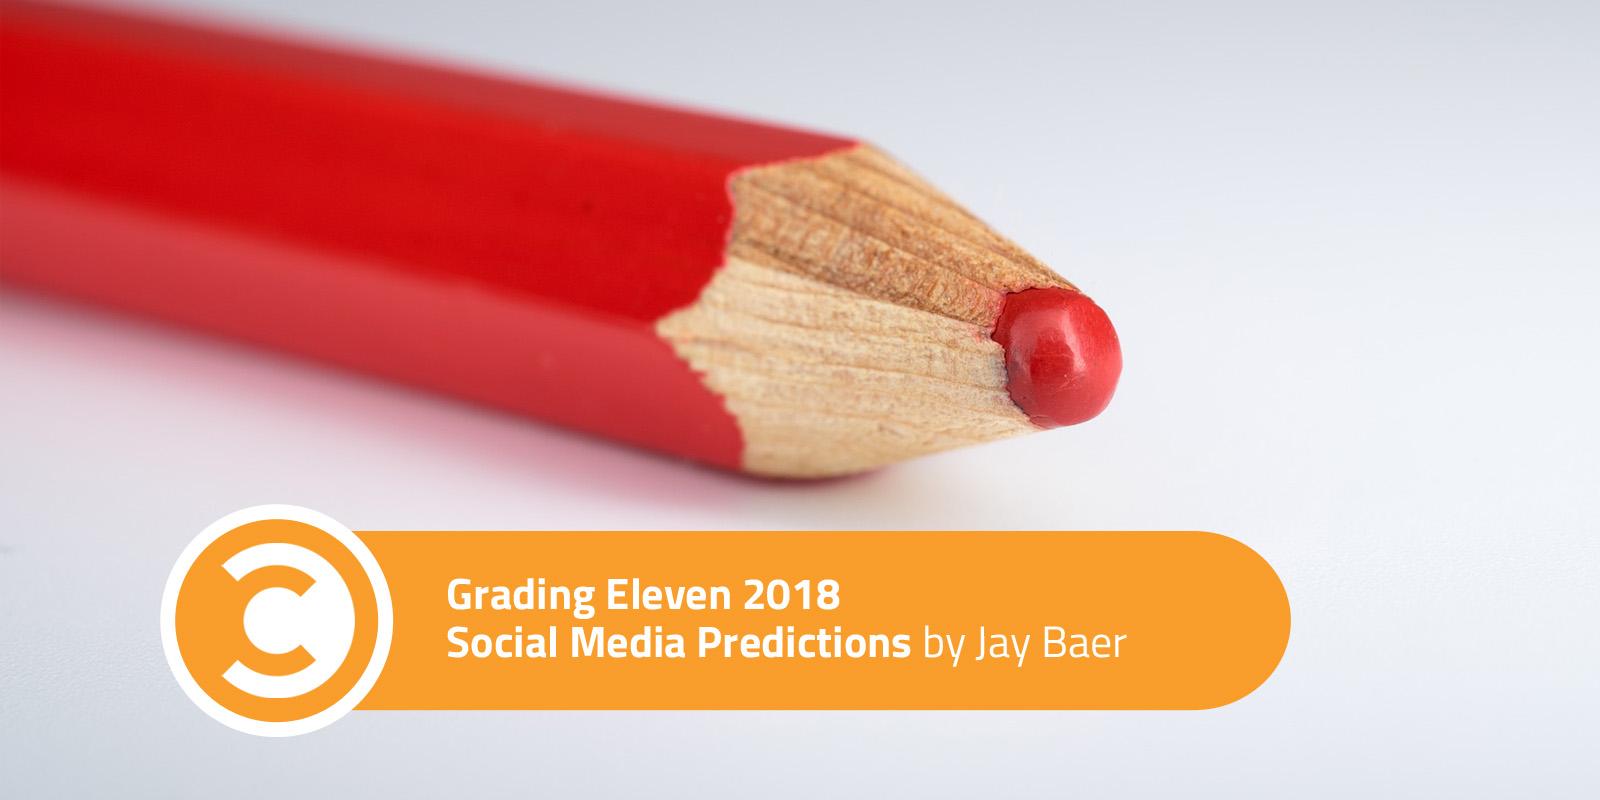 Grading Eleven 2018 Social Media Predictions